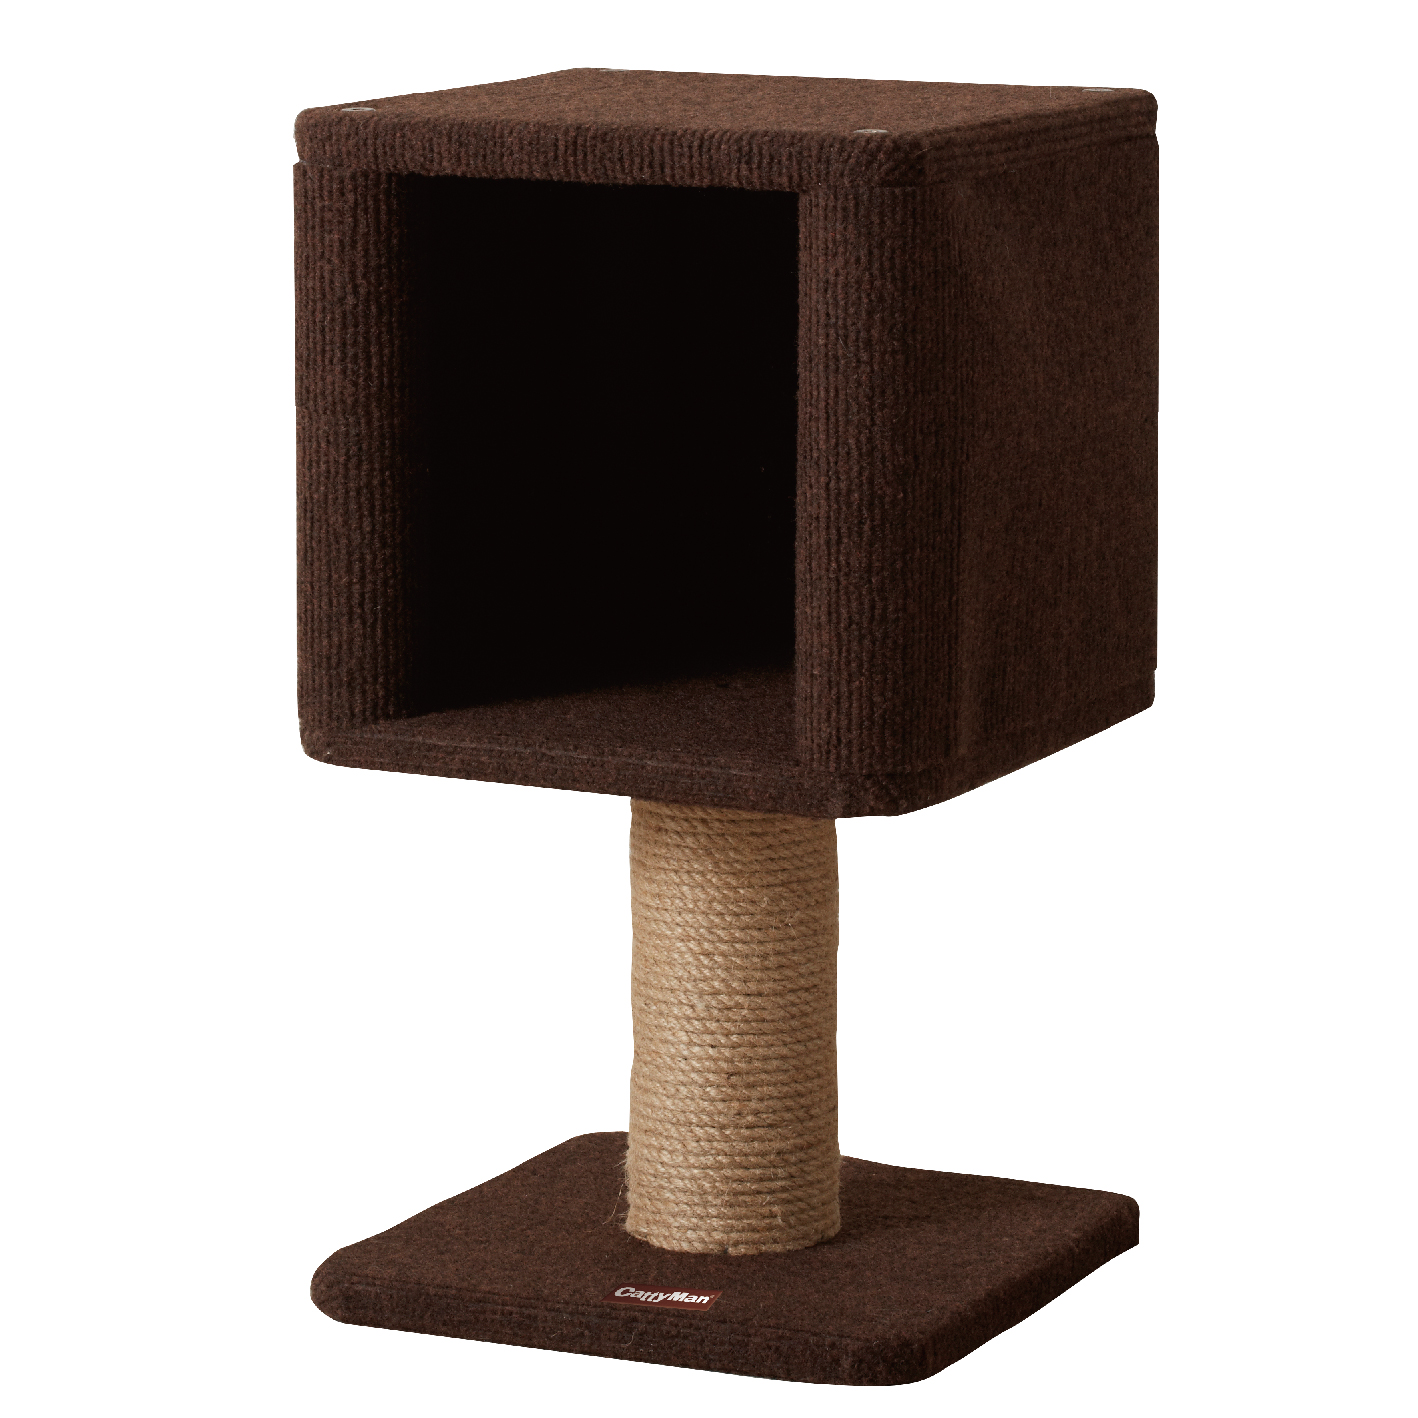 Tháp mèo mini (31x31x53)cm